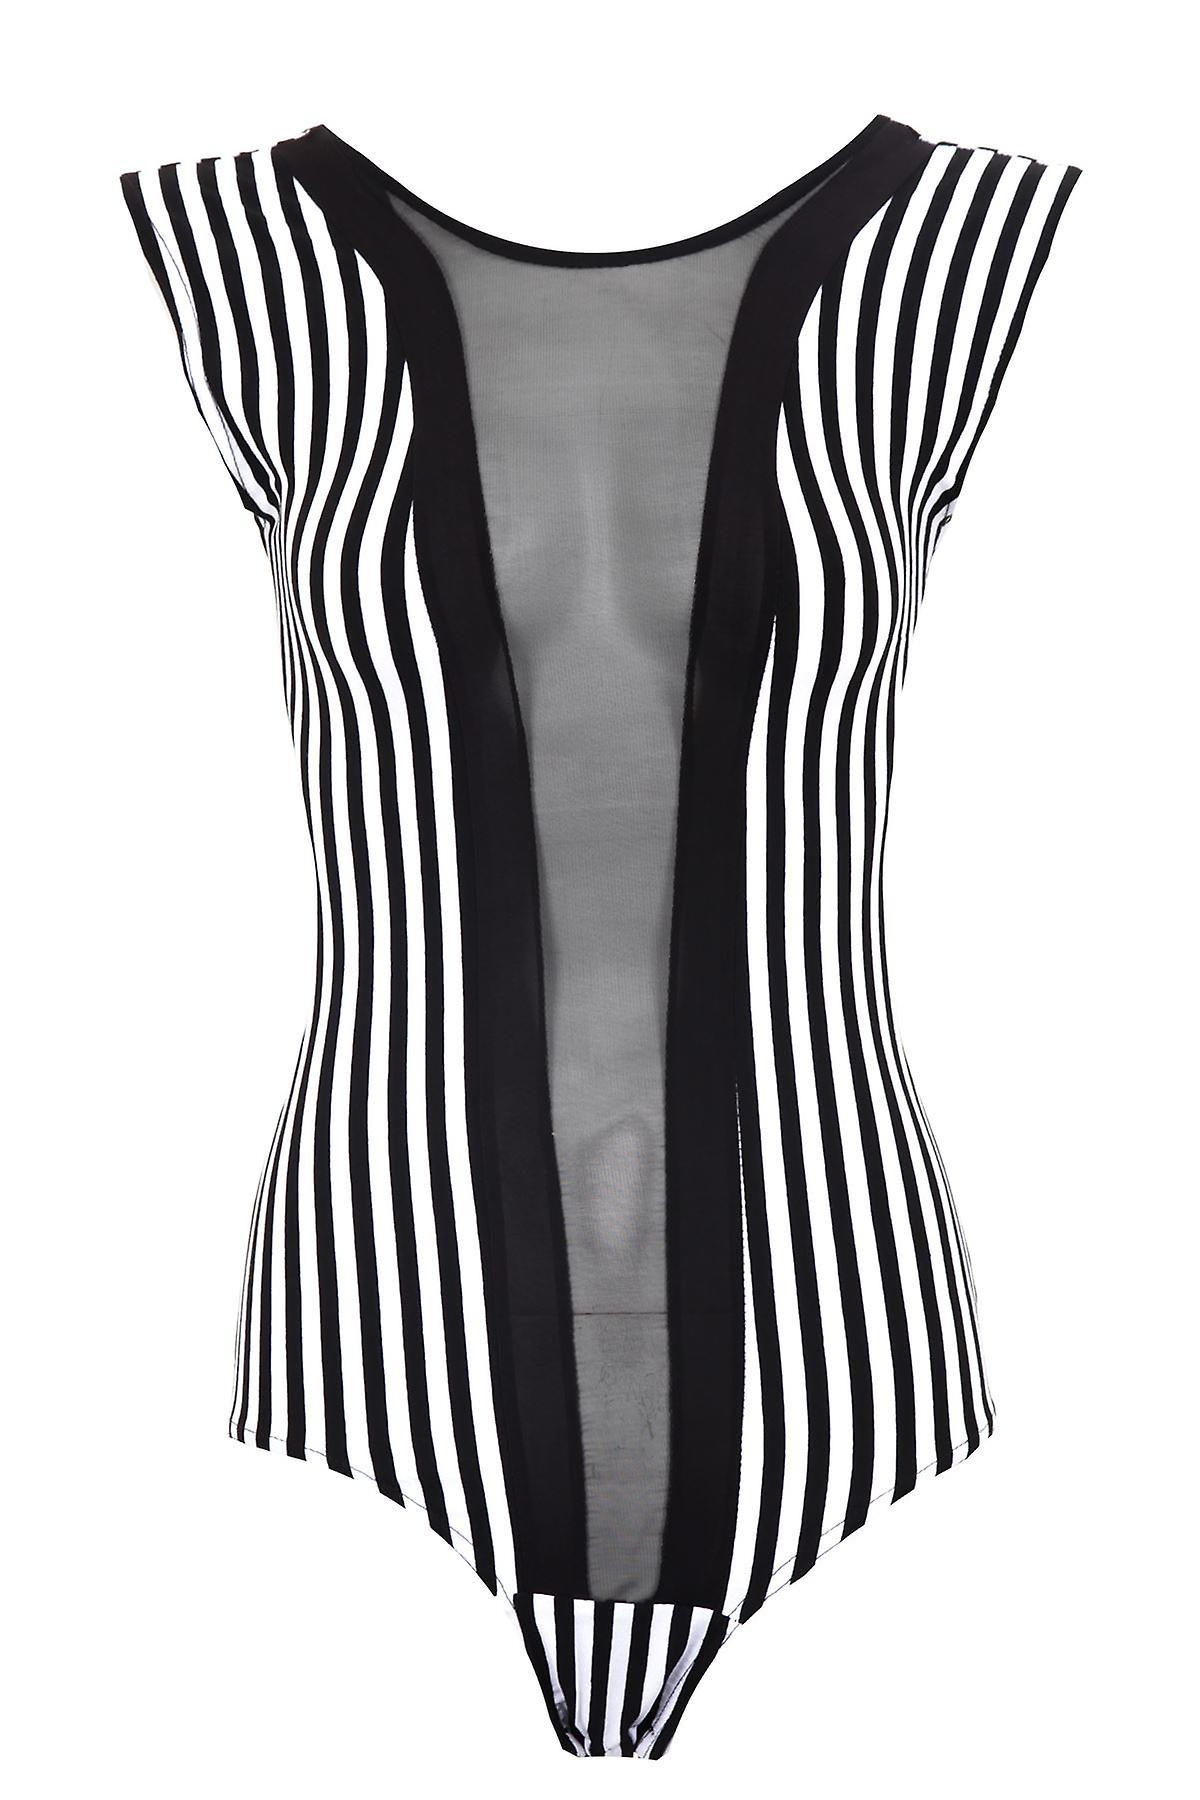 Ladies Bodysuit Long Sleeve Sleeveless Mesh Black White Stripe Leotard